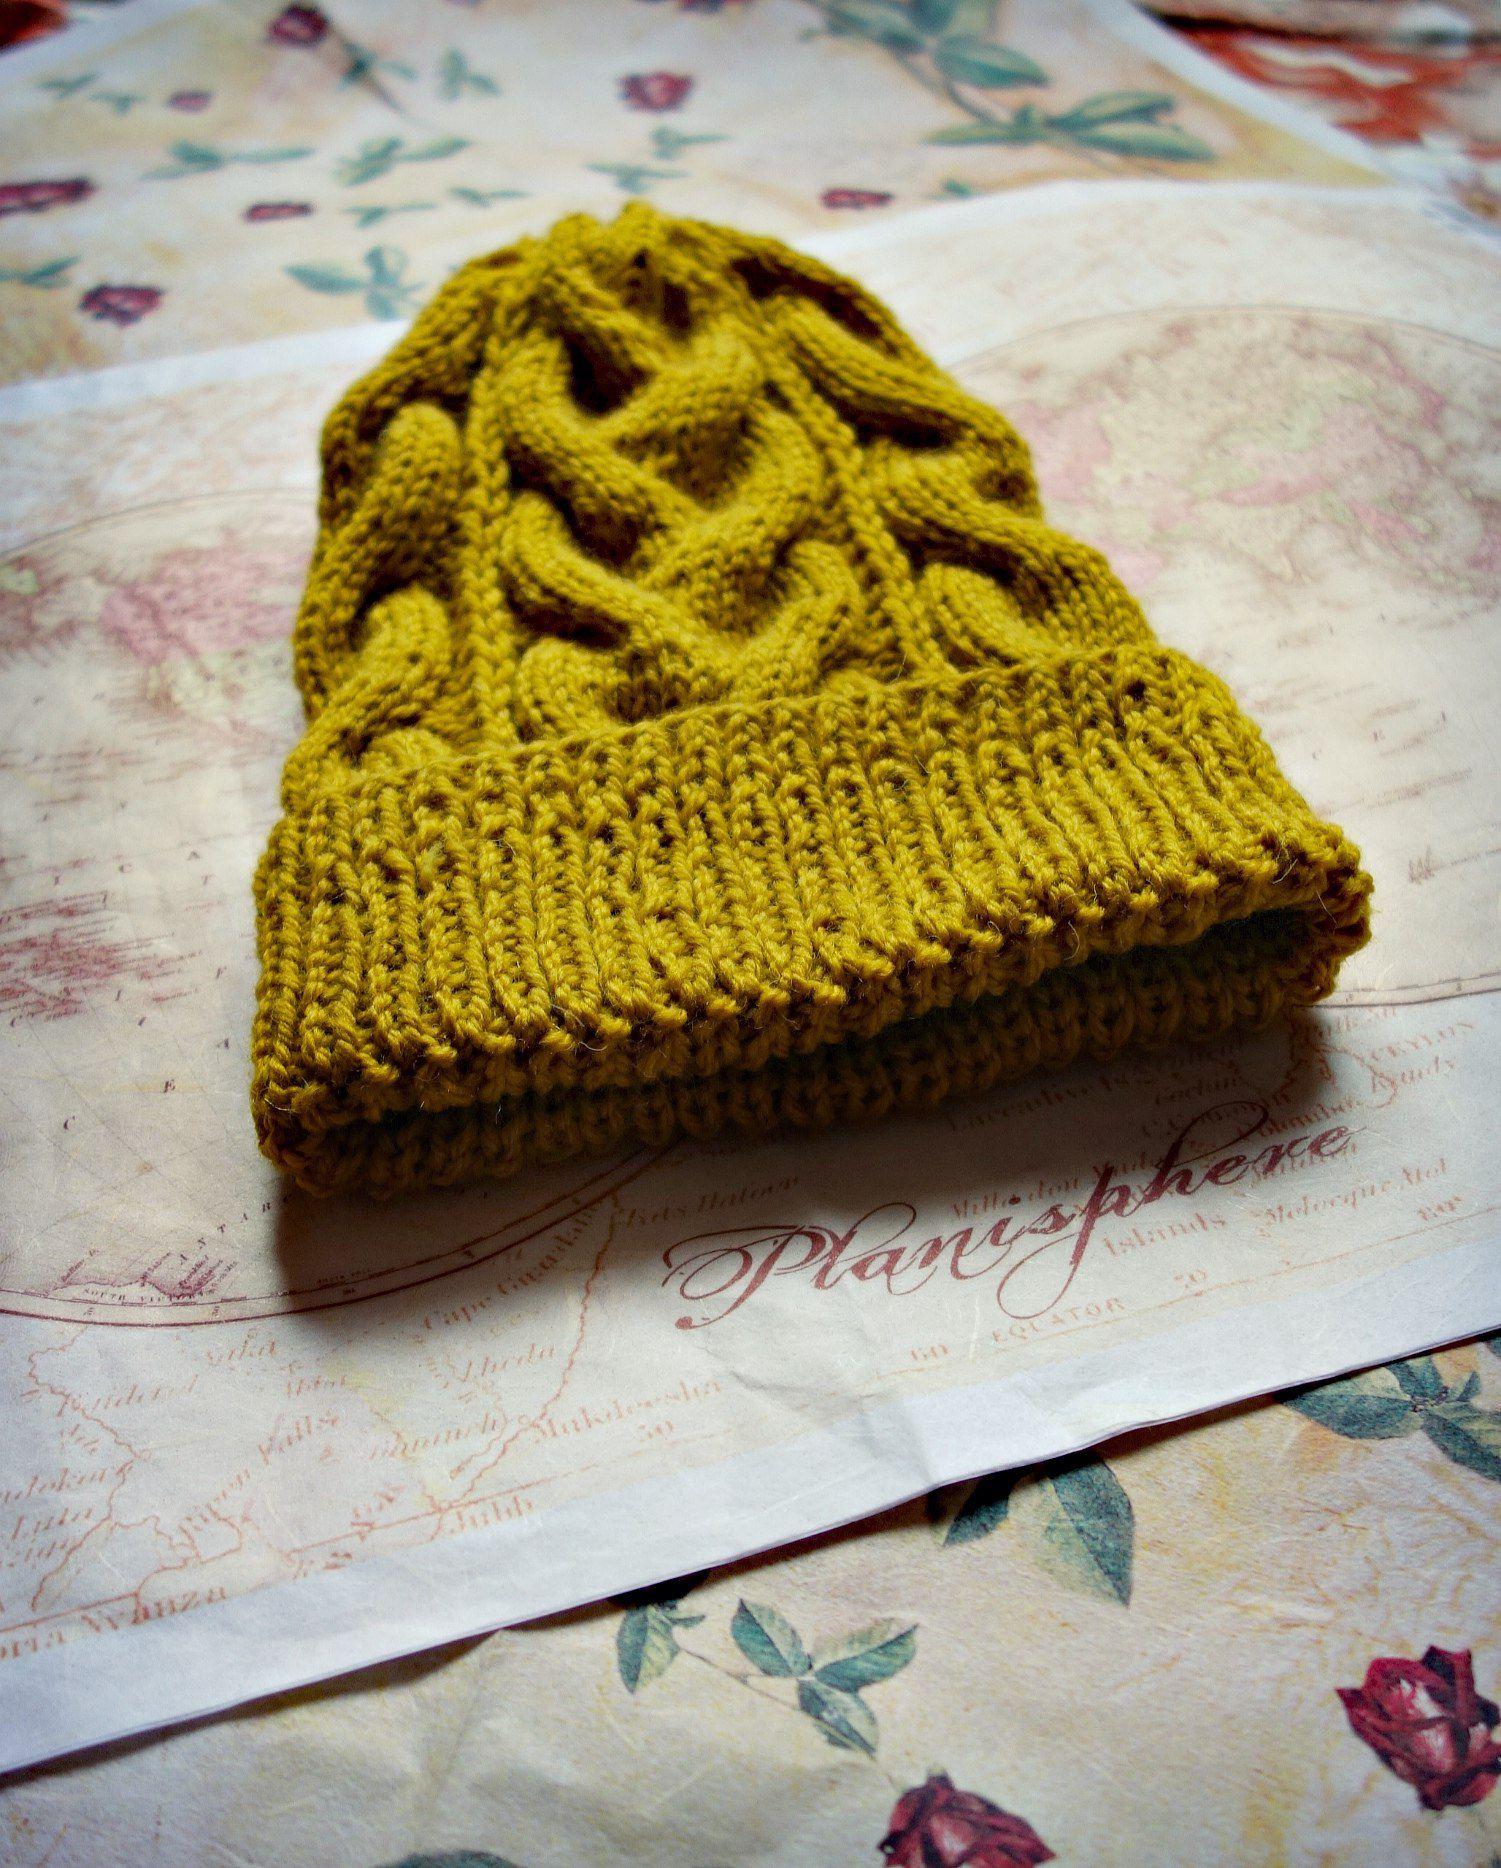 ручнаяработа мода вязание шапкаскосами шапкаженская шапкавязаная стиль шапказимняя шапка аксессуар желтаяшапка моднаяшапка